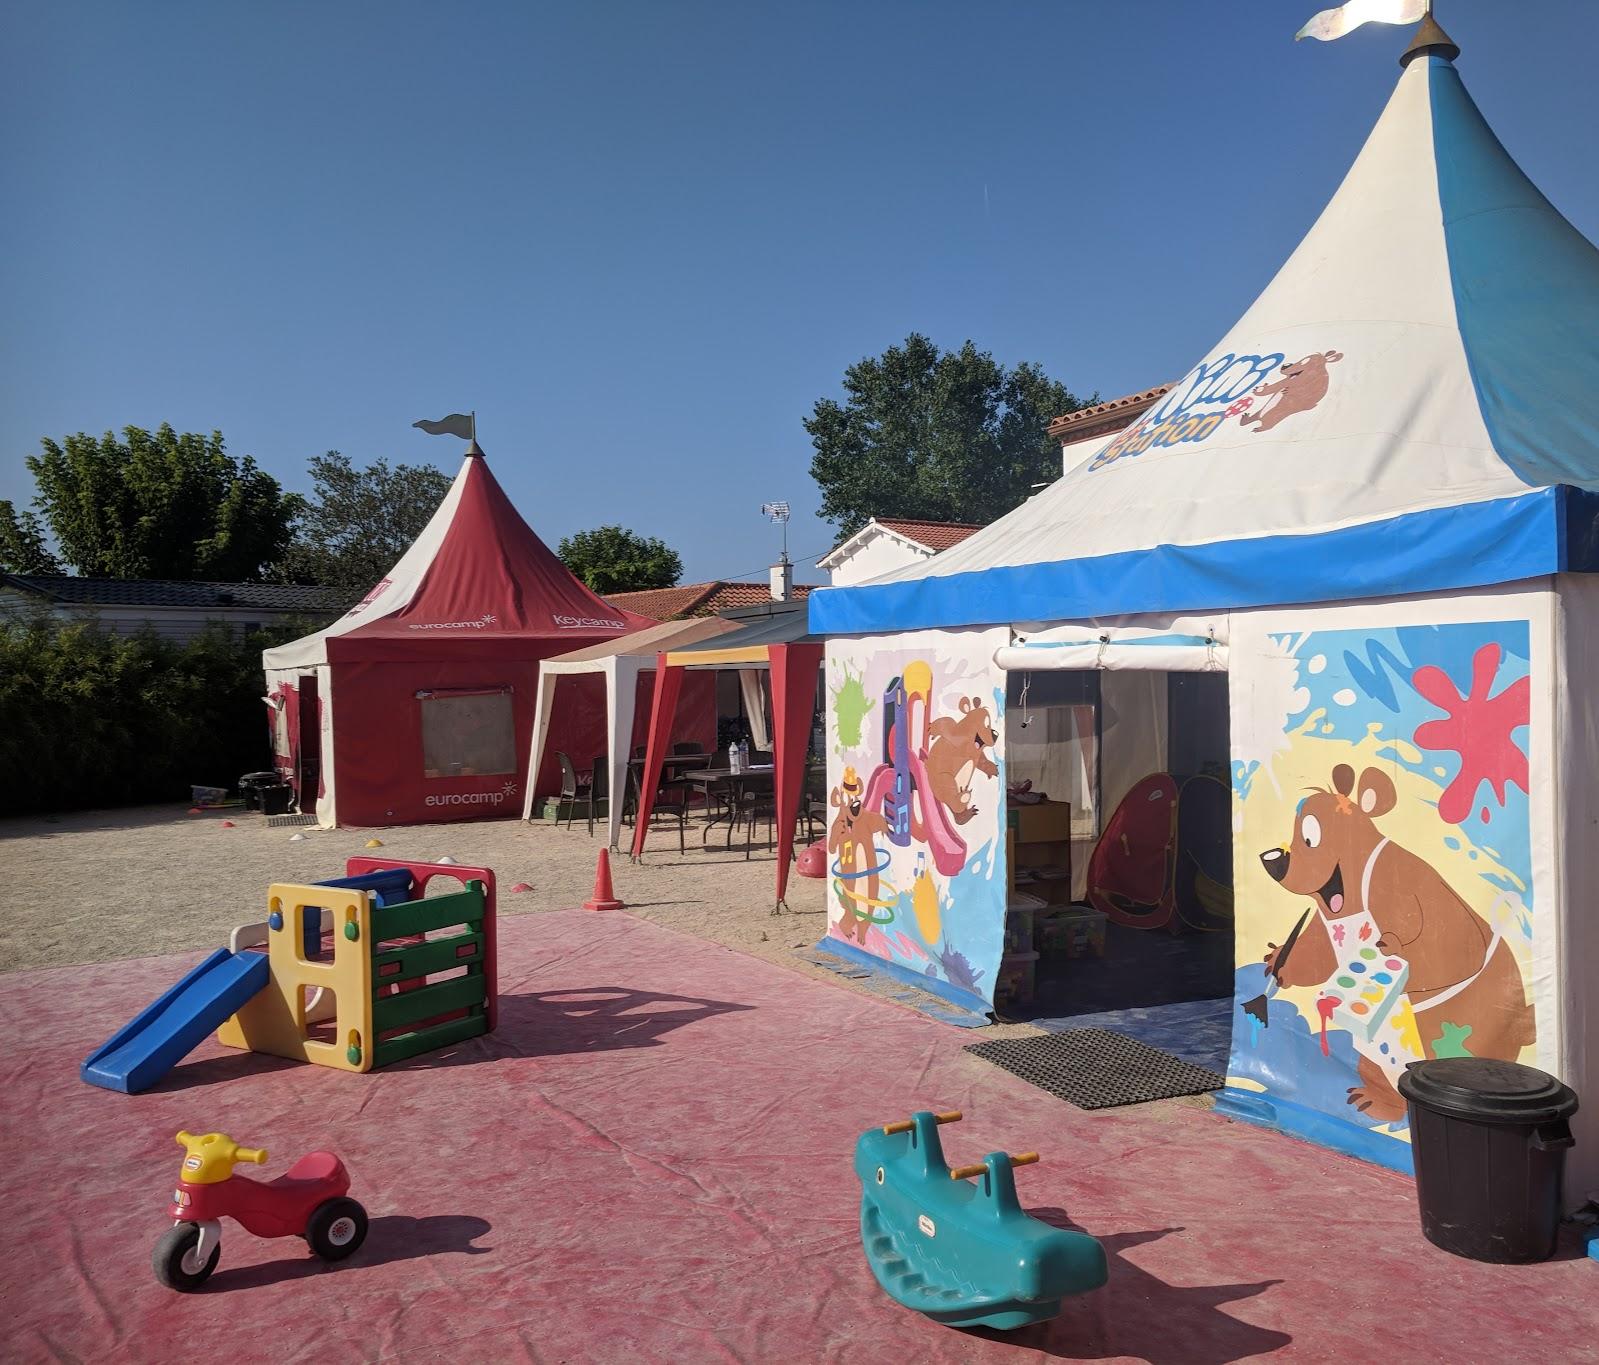 Les Ecureuils Campsite, Vendee - A Eurocamp Site near Puy du Fou (Full Review) - free kids club